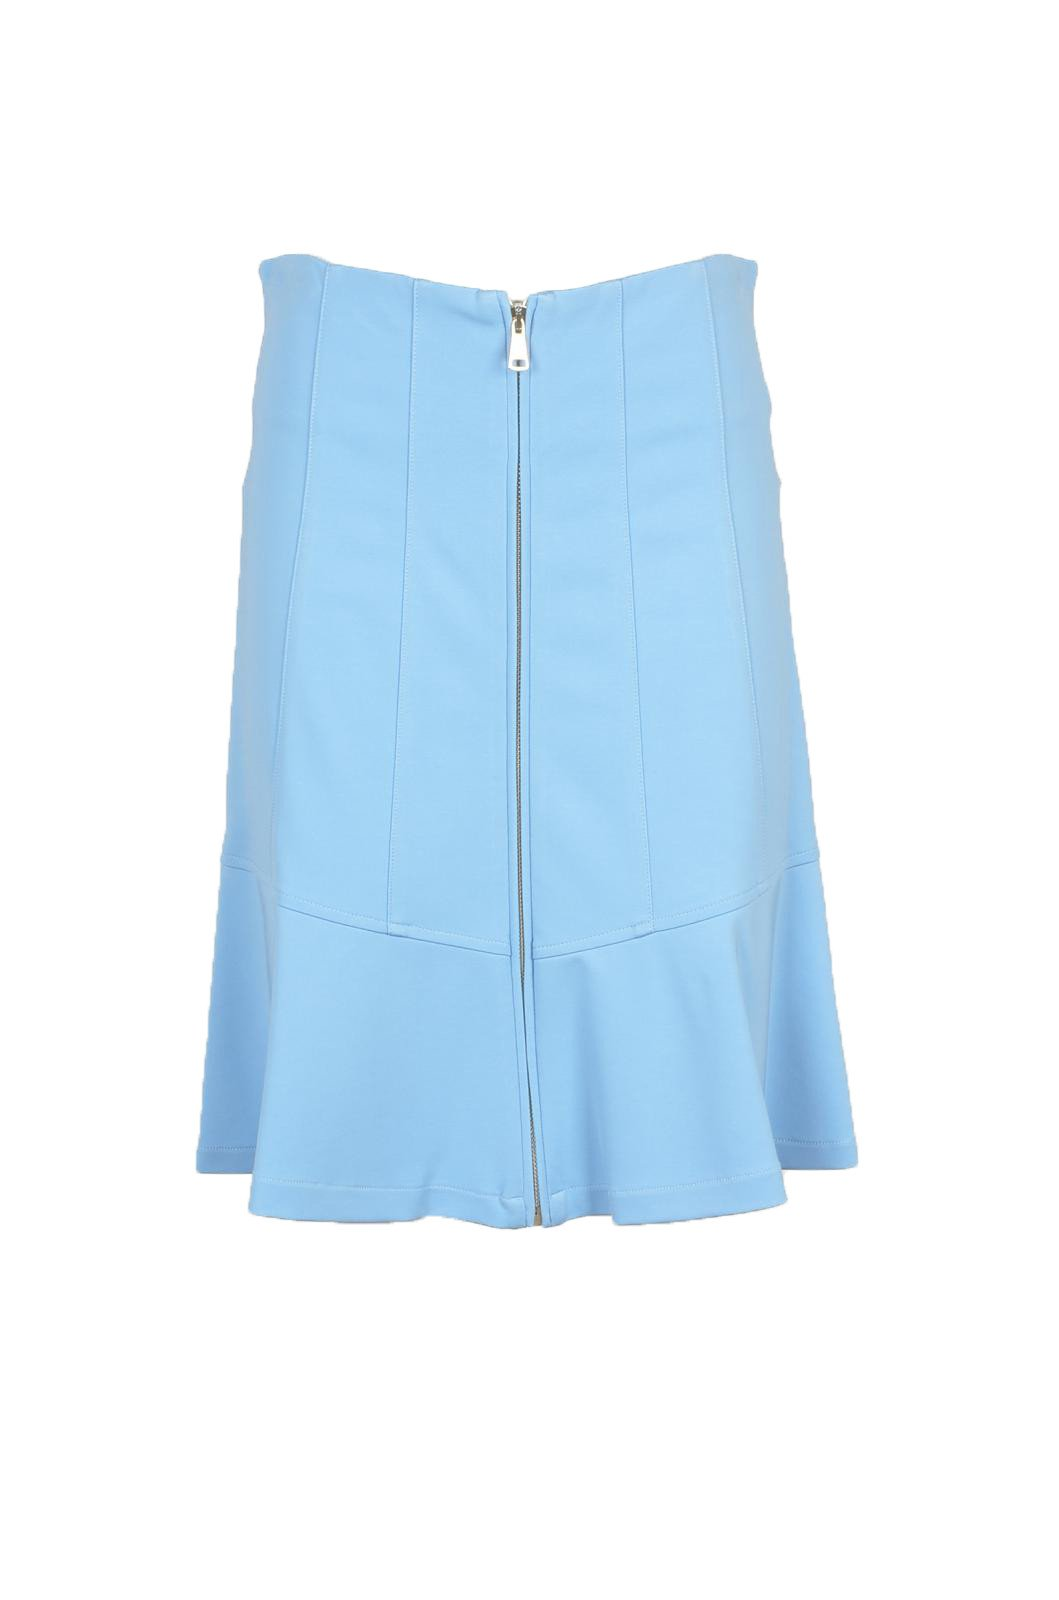 Pinko Women's Skirts Various Colours 263157 - light blue 40